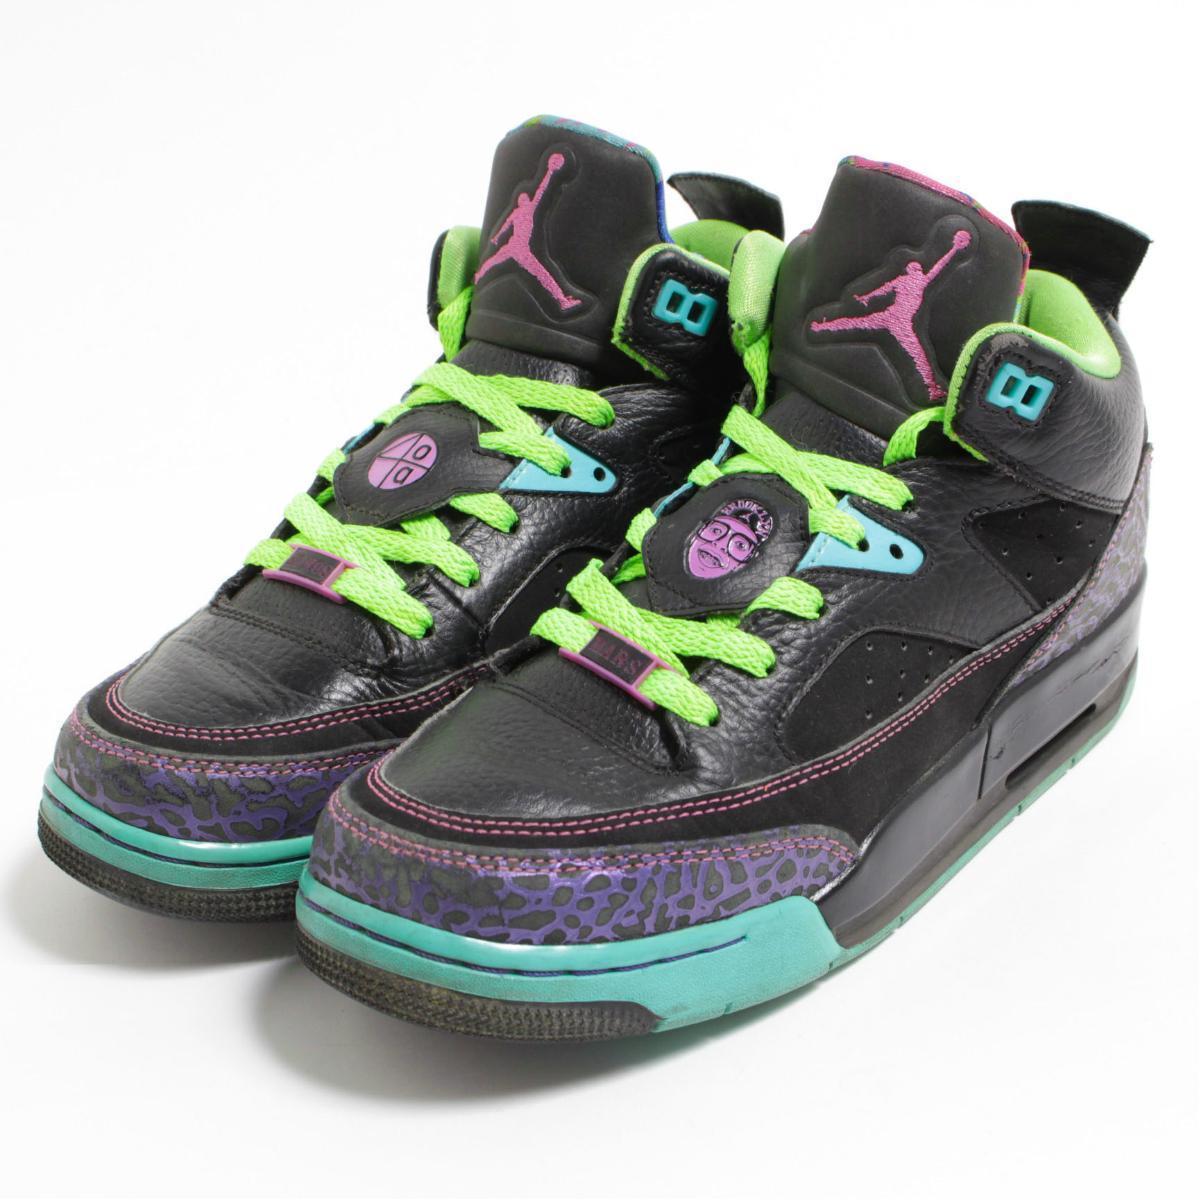 03563740d6b18b Nike NIKE JORDAN SON OF MARS LOW sneakers US7Y Lady s 25.0cm  boo1951